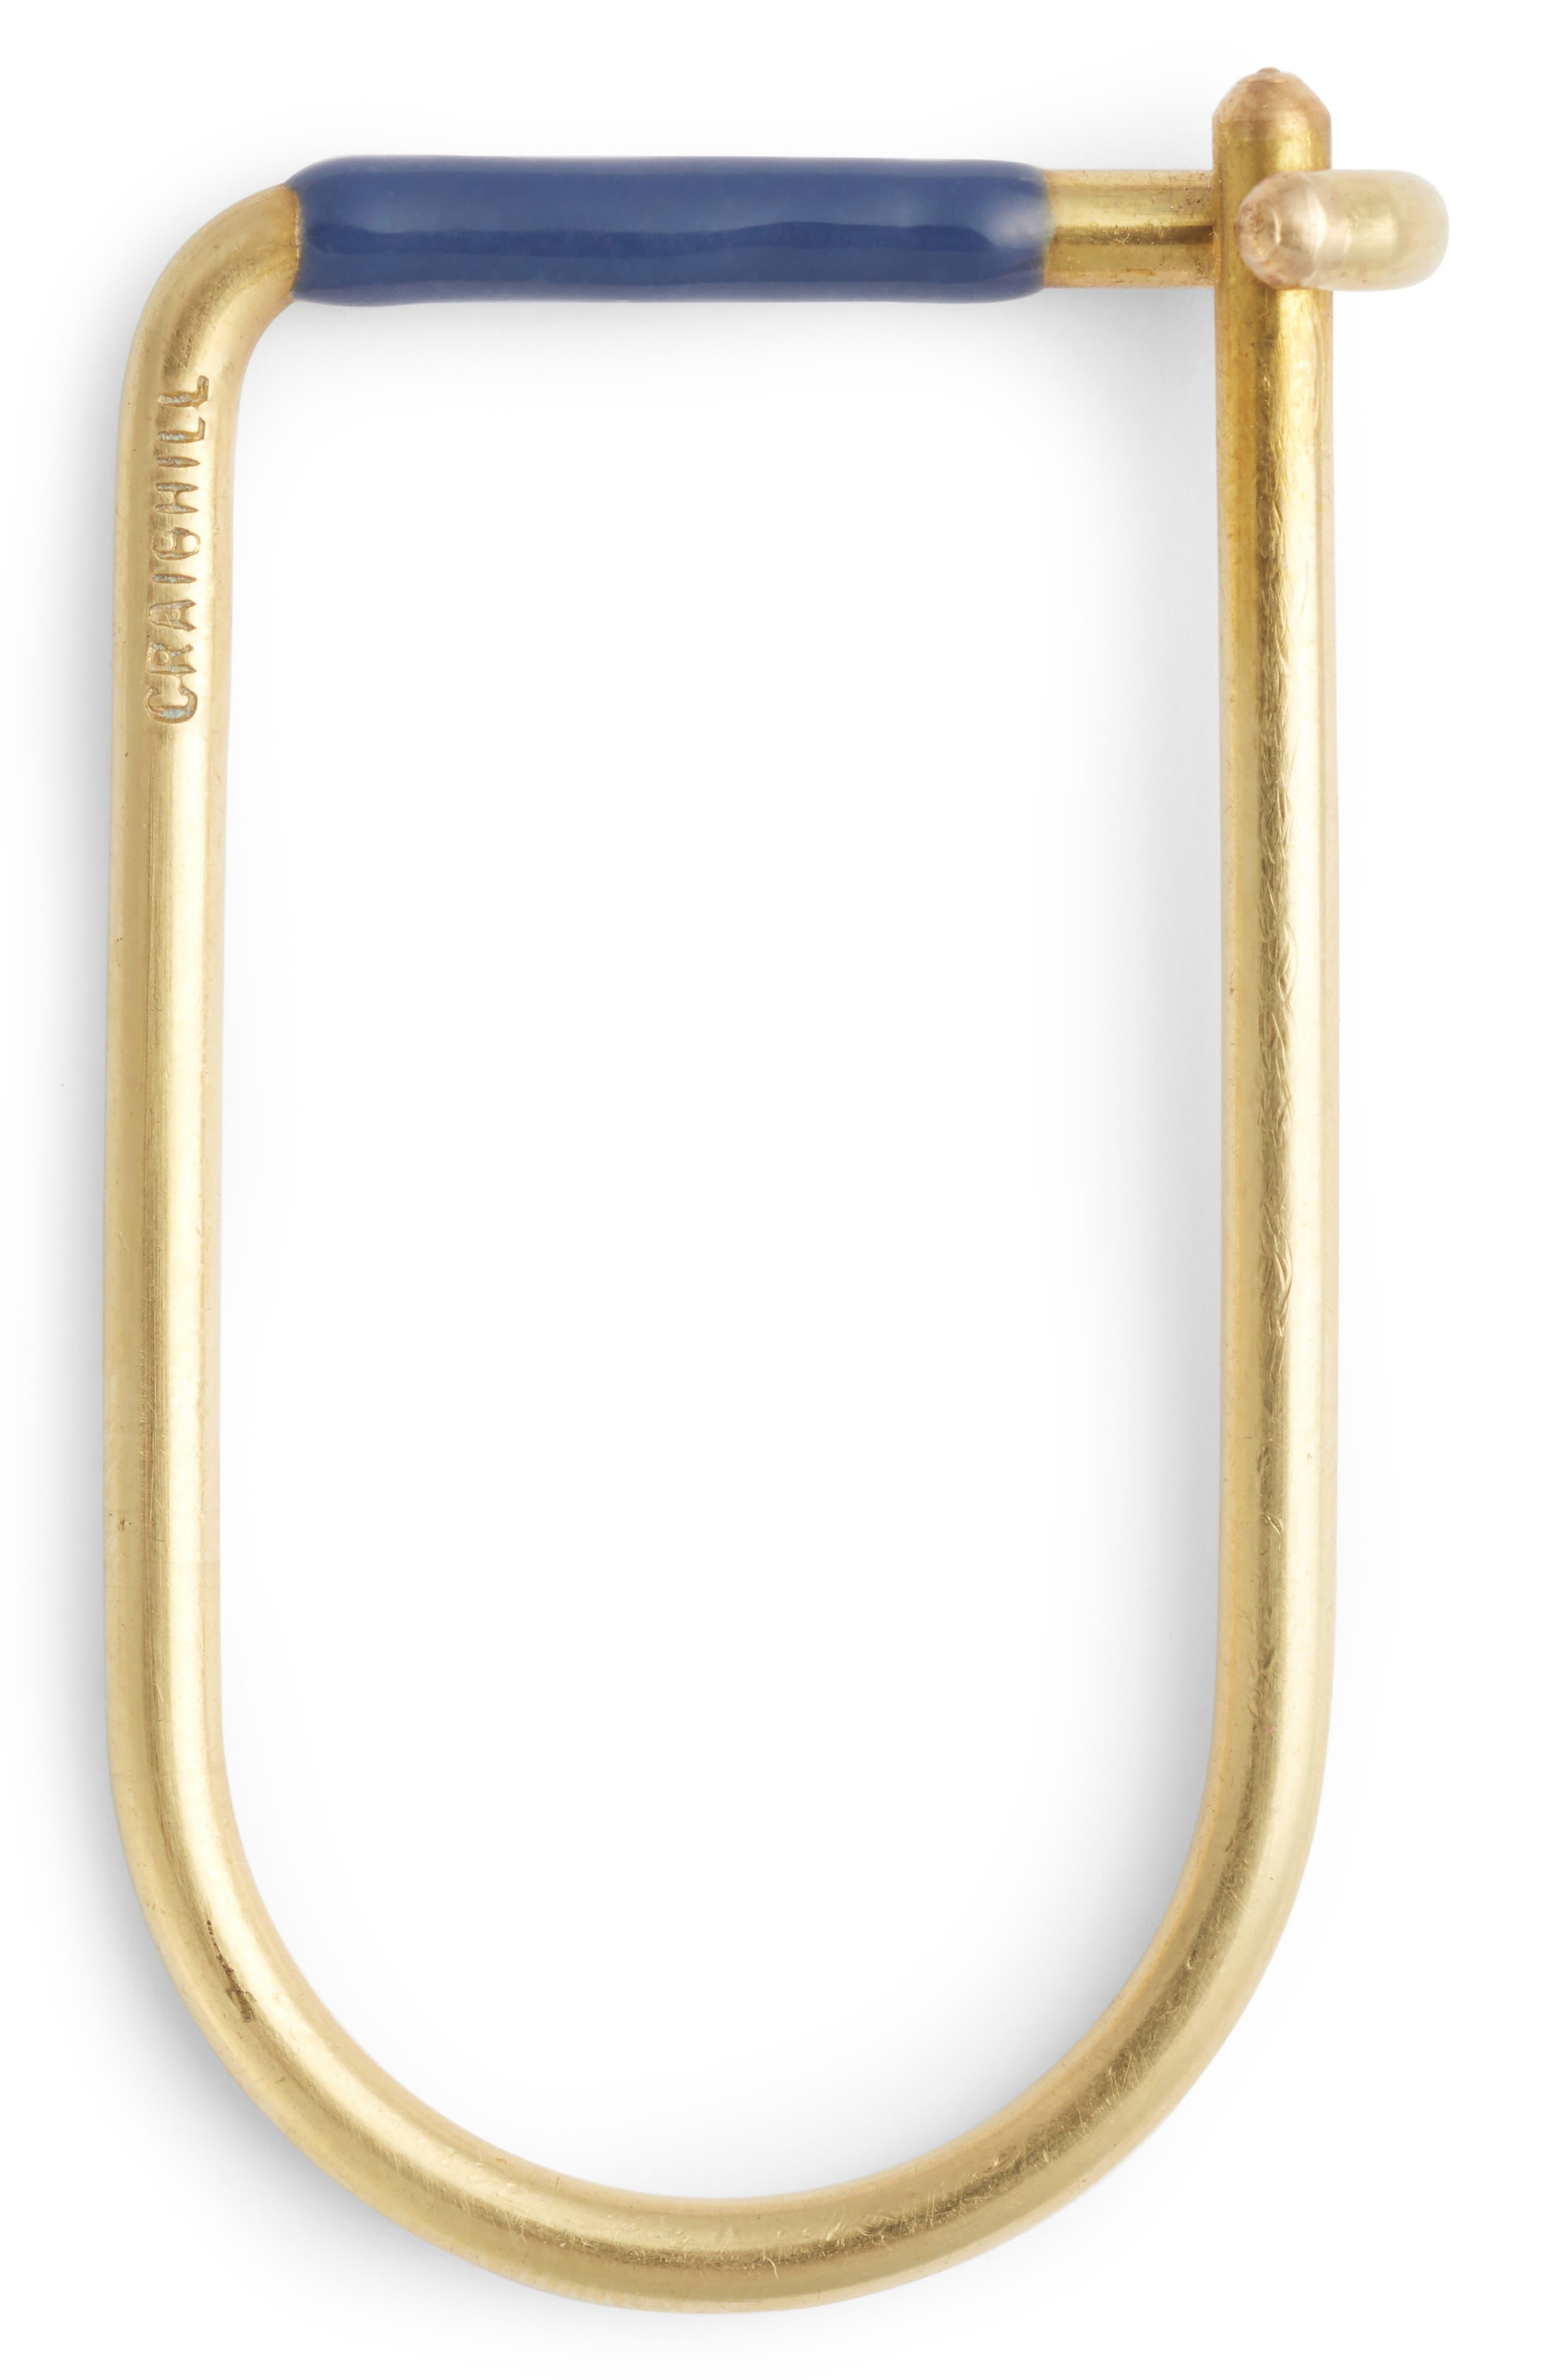 Main Image - Craighill Wilson Enameled Brass Key Ring